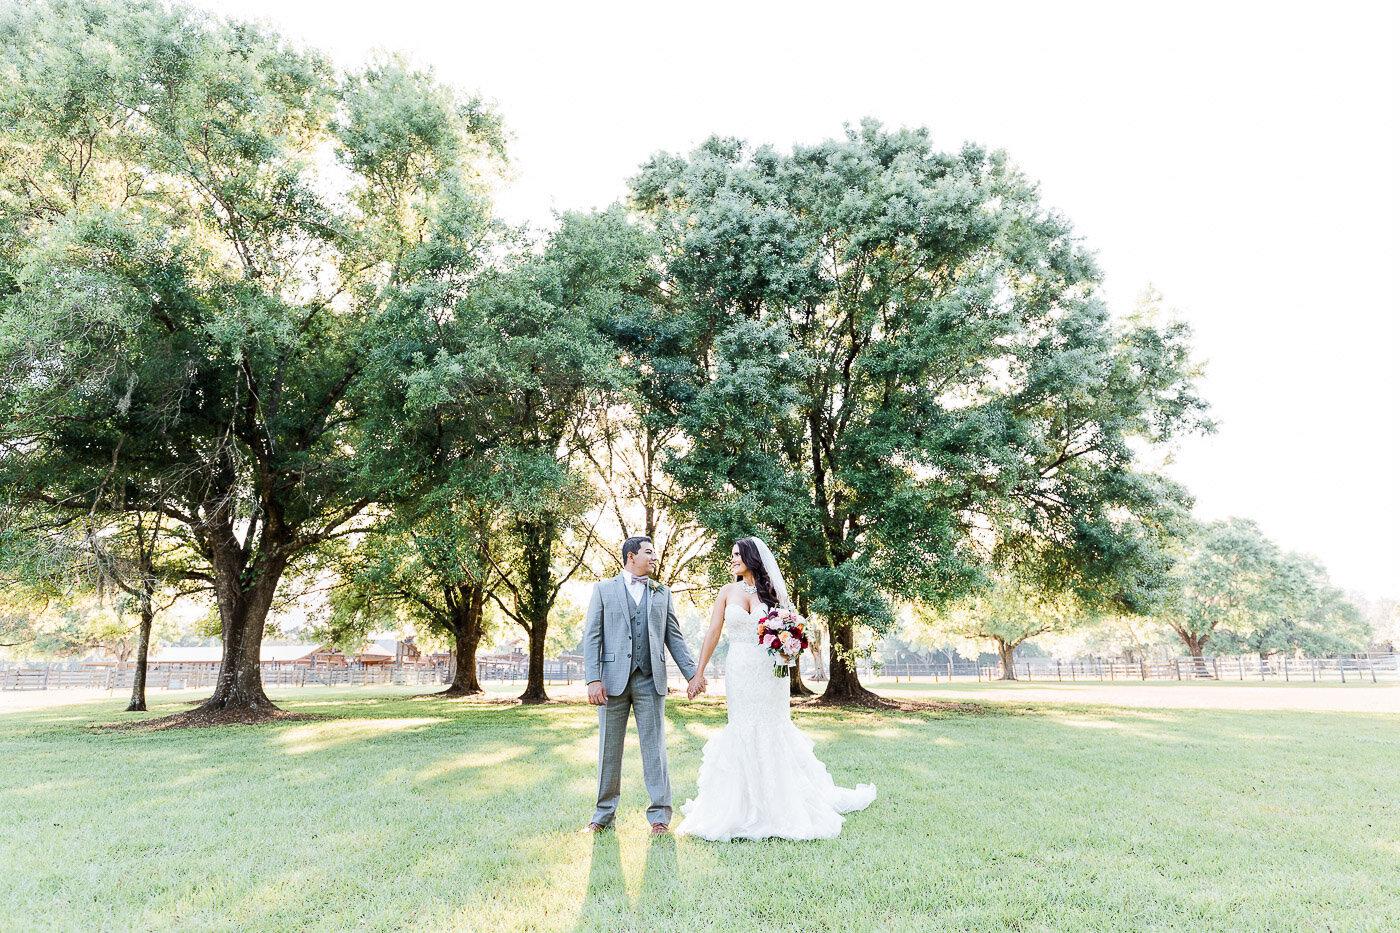 Lakeland-barn-wedding-at-white-horse-ranch-52.jpg